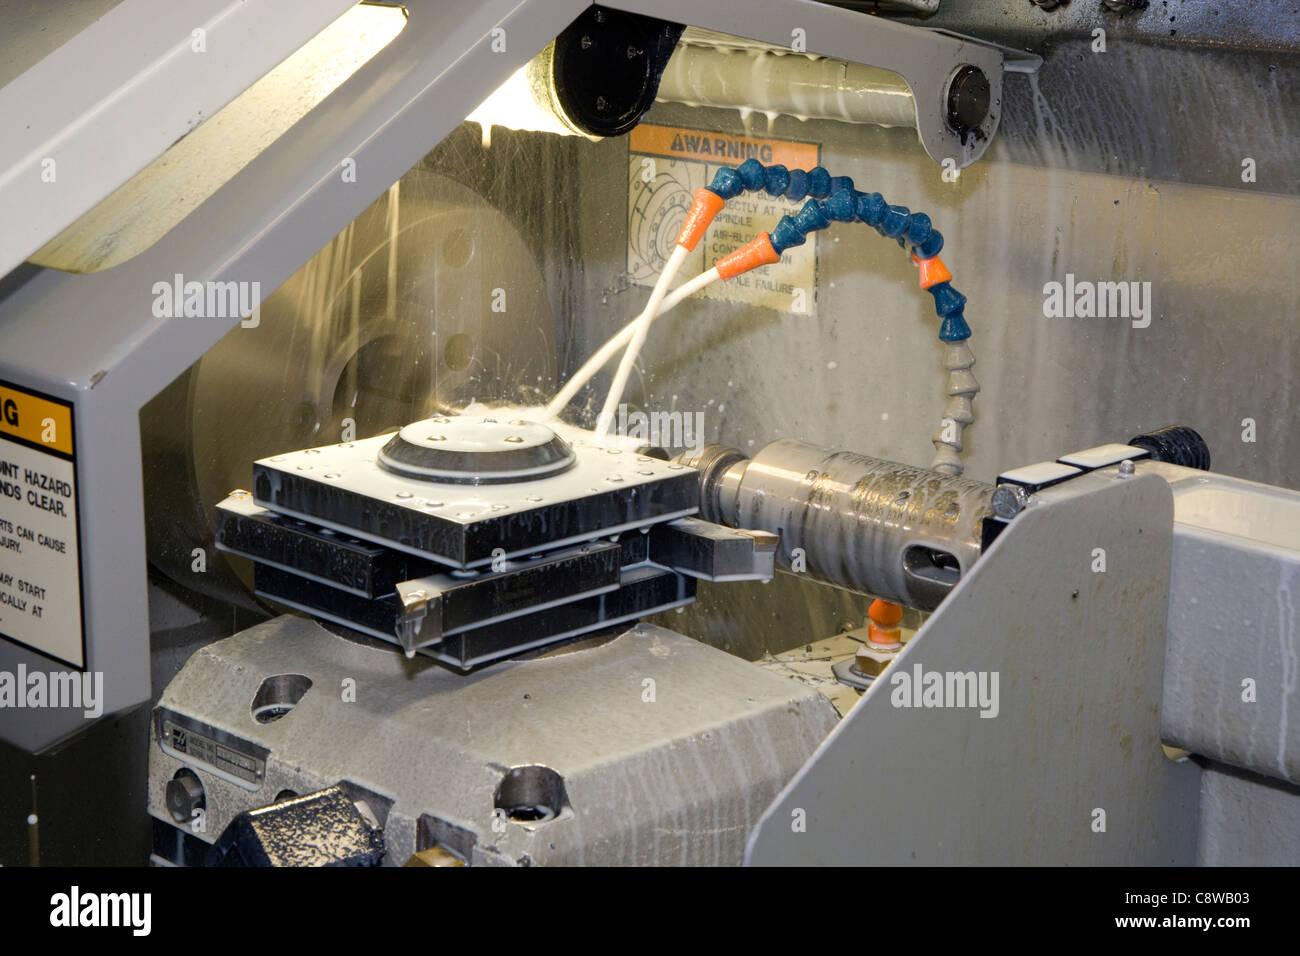 CNC lathe working on job detail - Stock Image